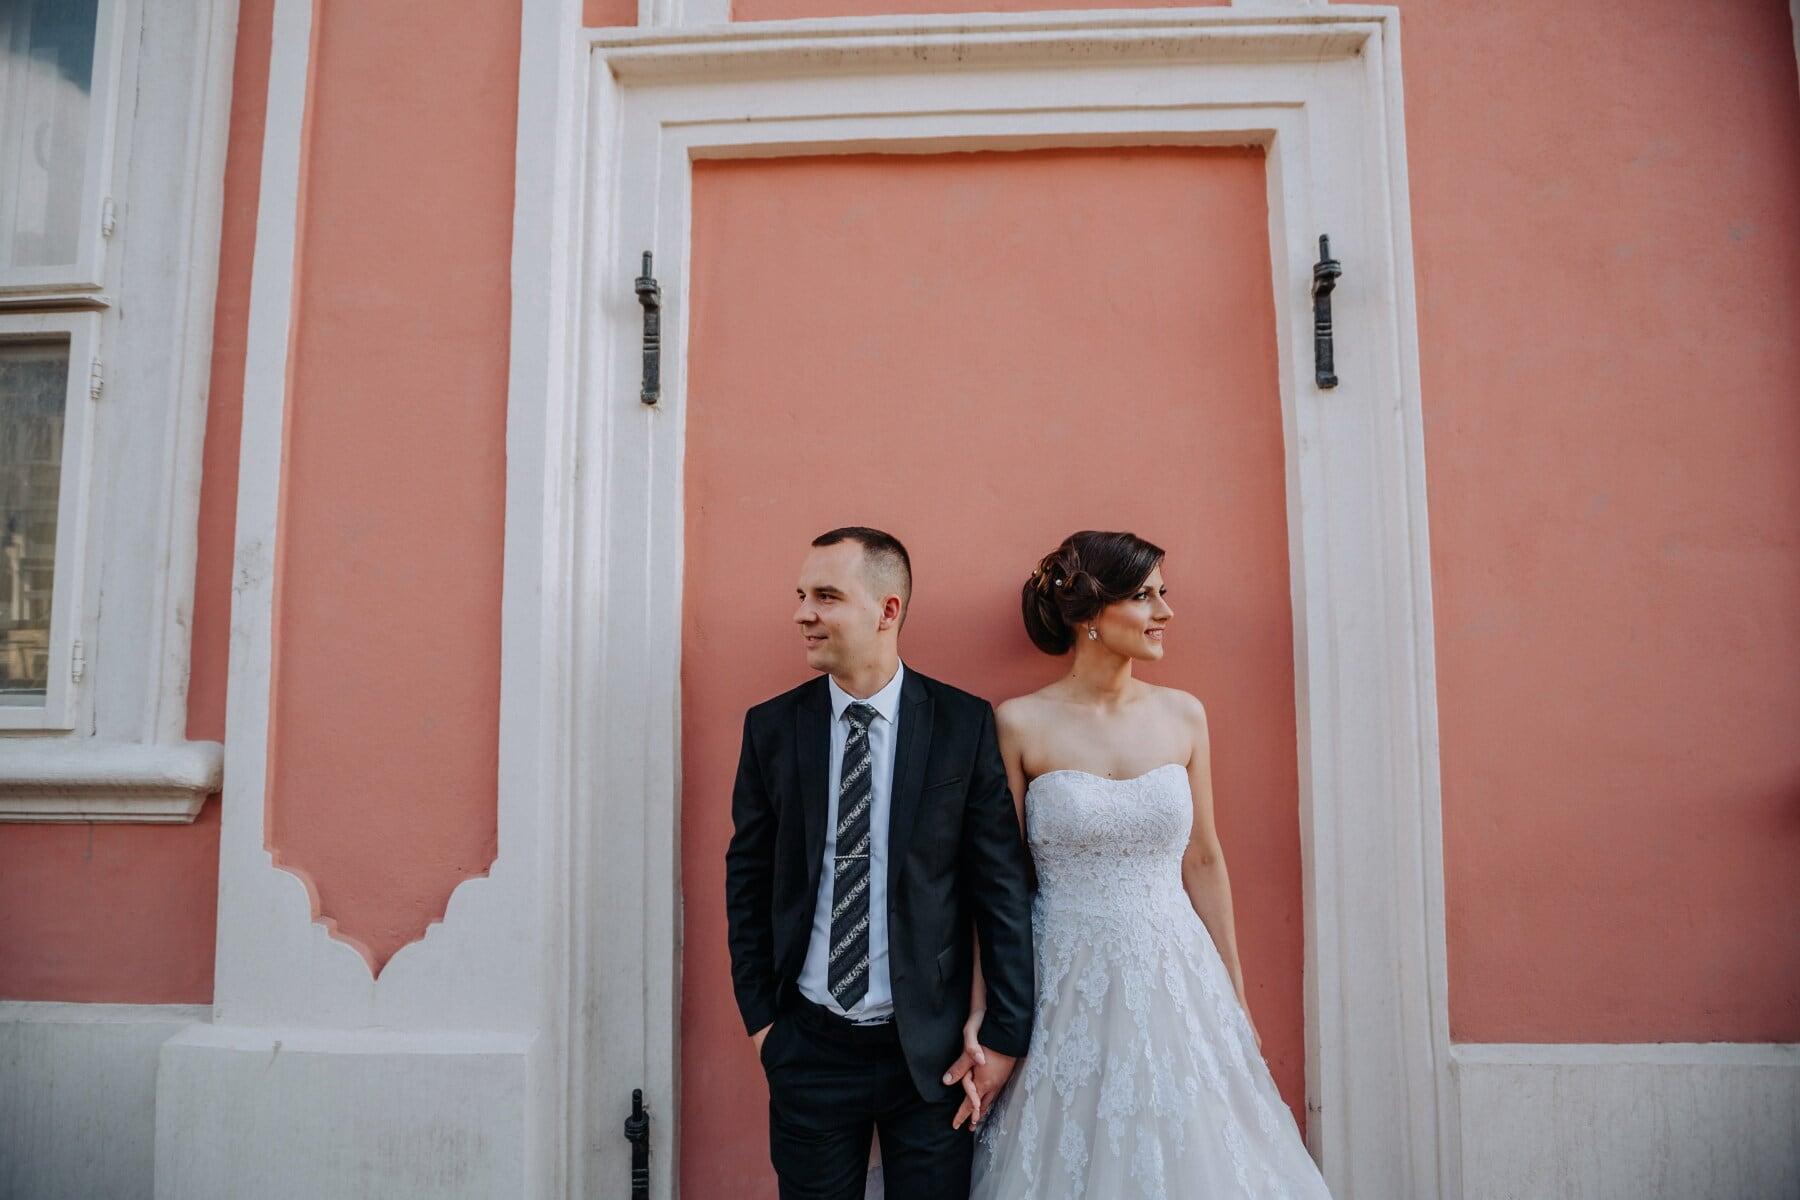 groom, bride, wedding dress, suit, side view, woman, bouquet, dress, married, marriage